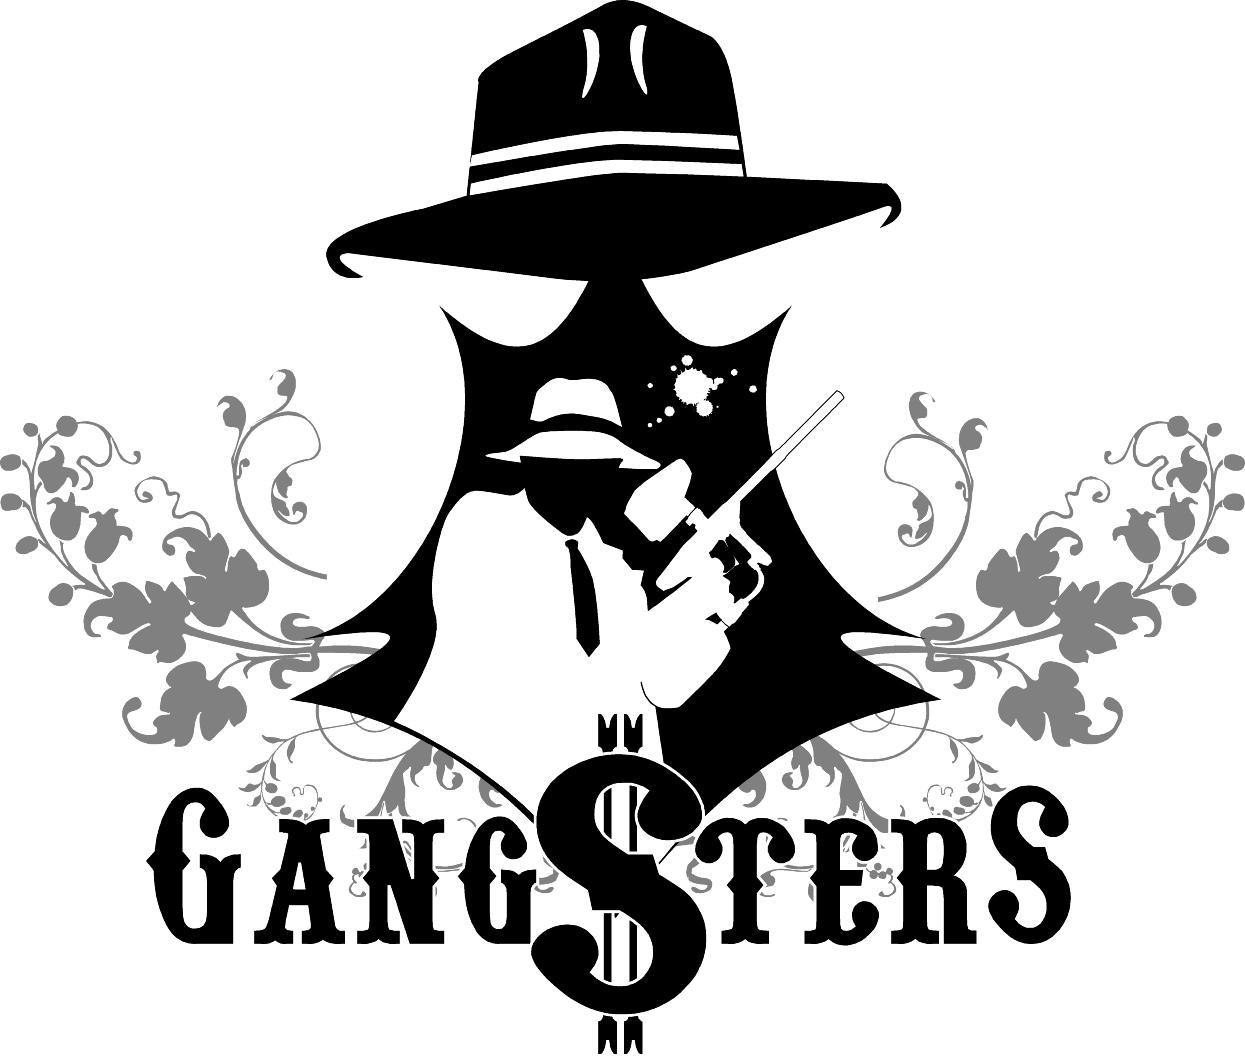 Gangster Nicknames